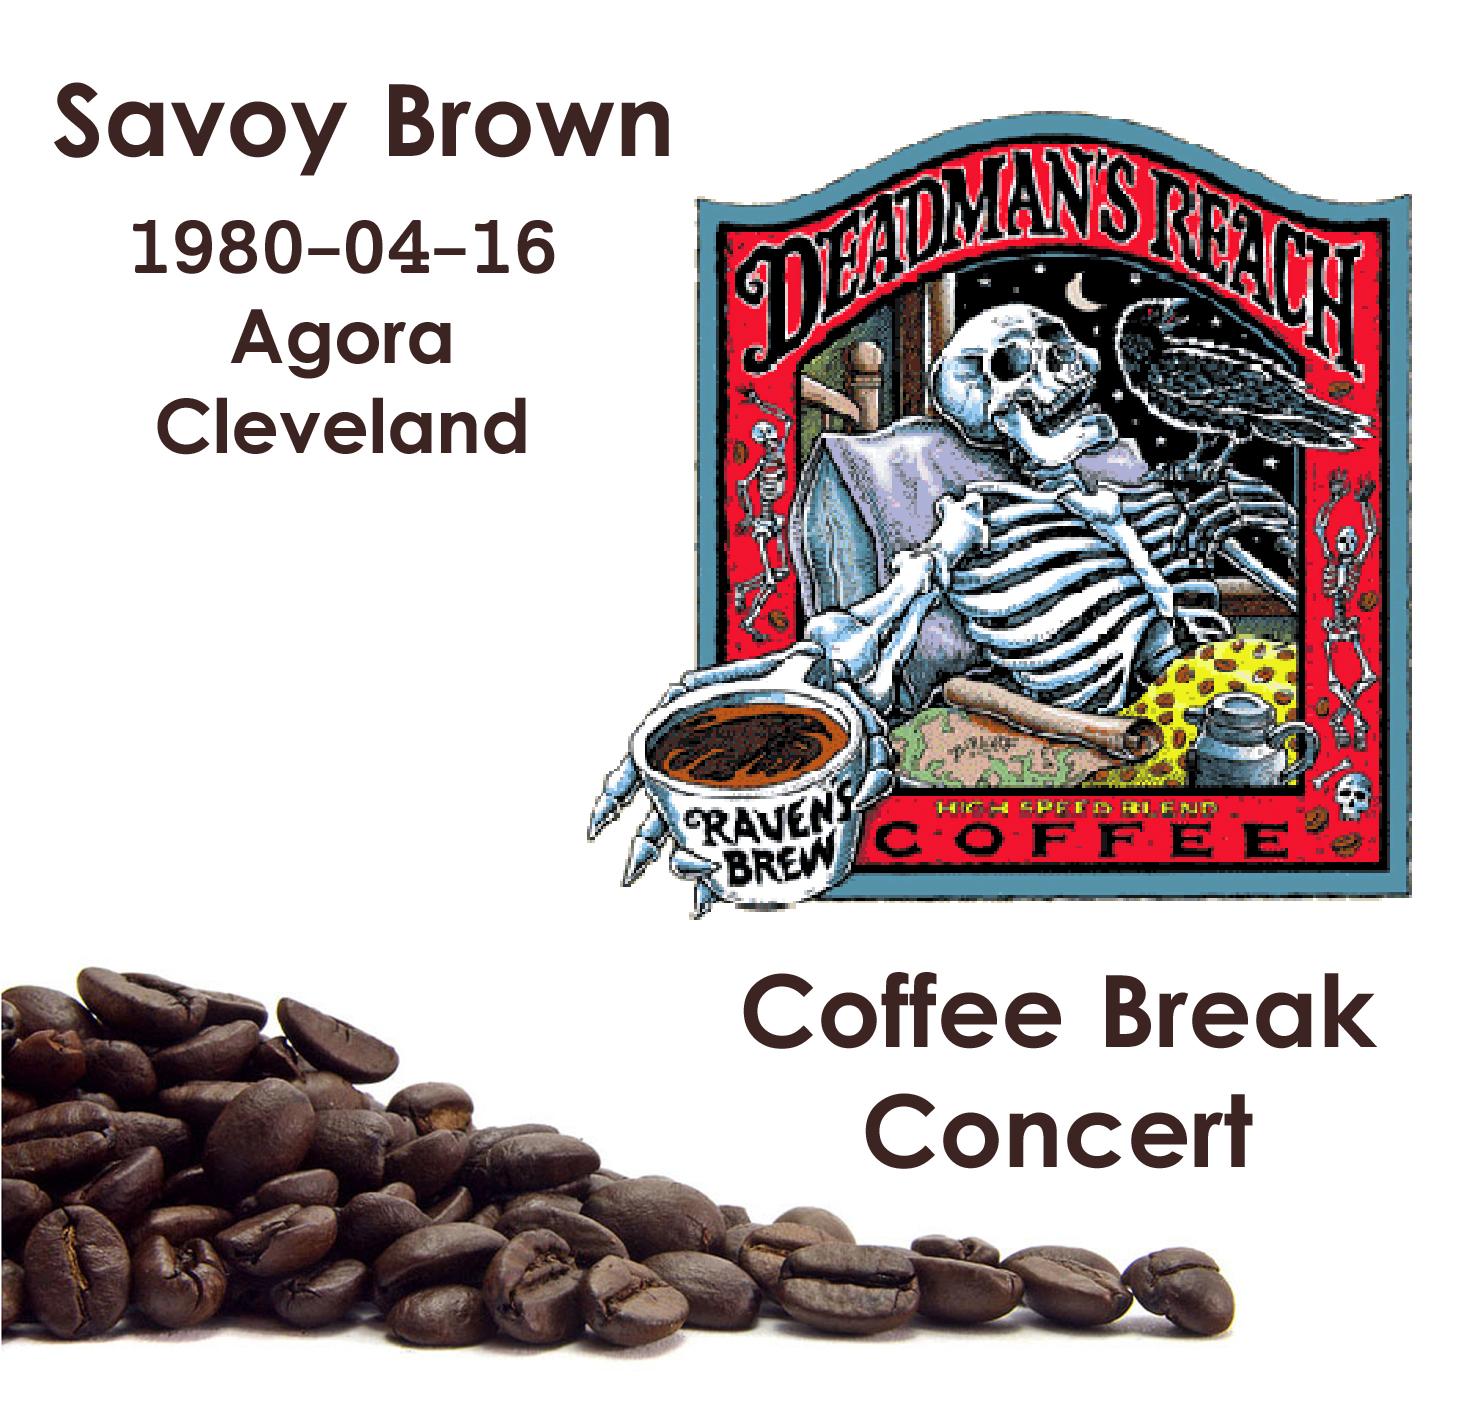 CastelarBlues: CD - Savoy Brown - Coffee Break Concert,The